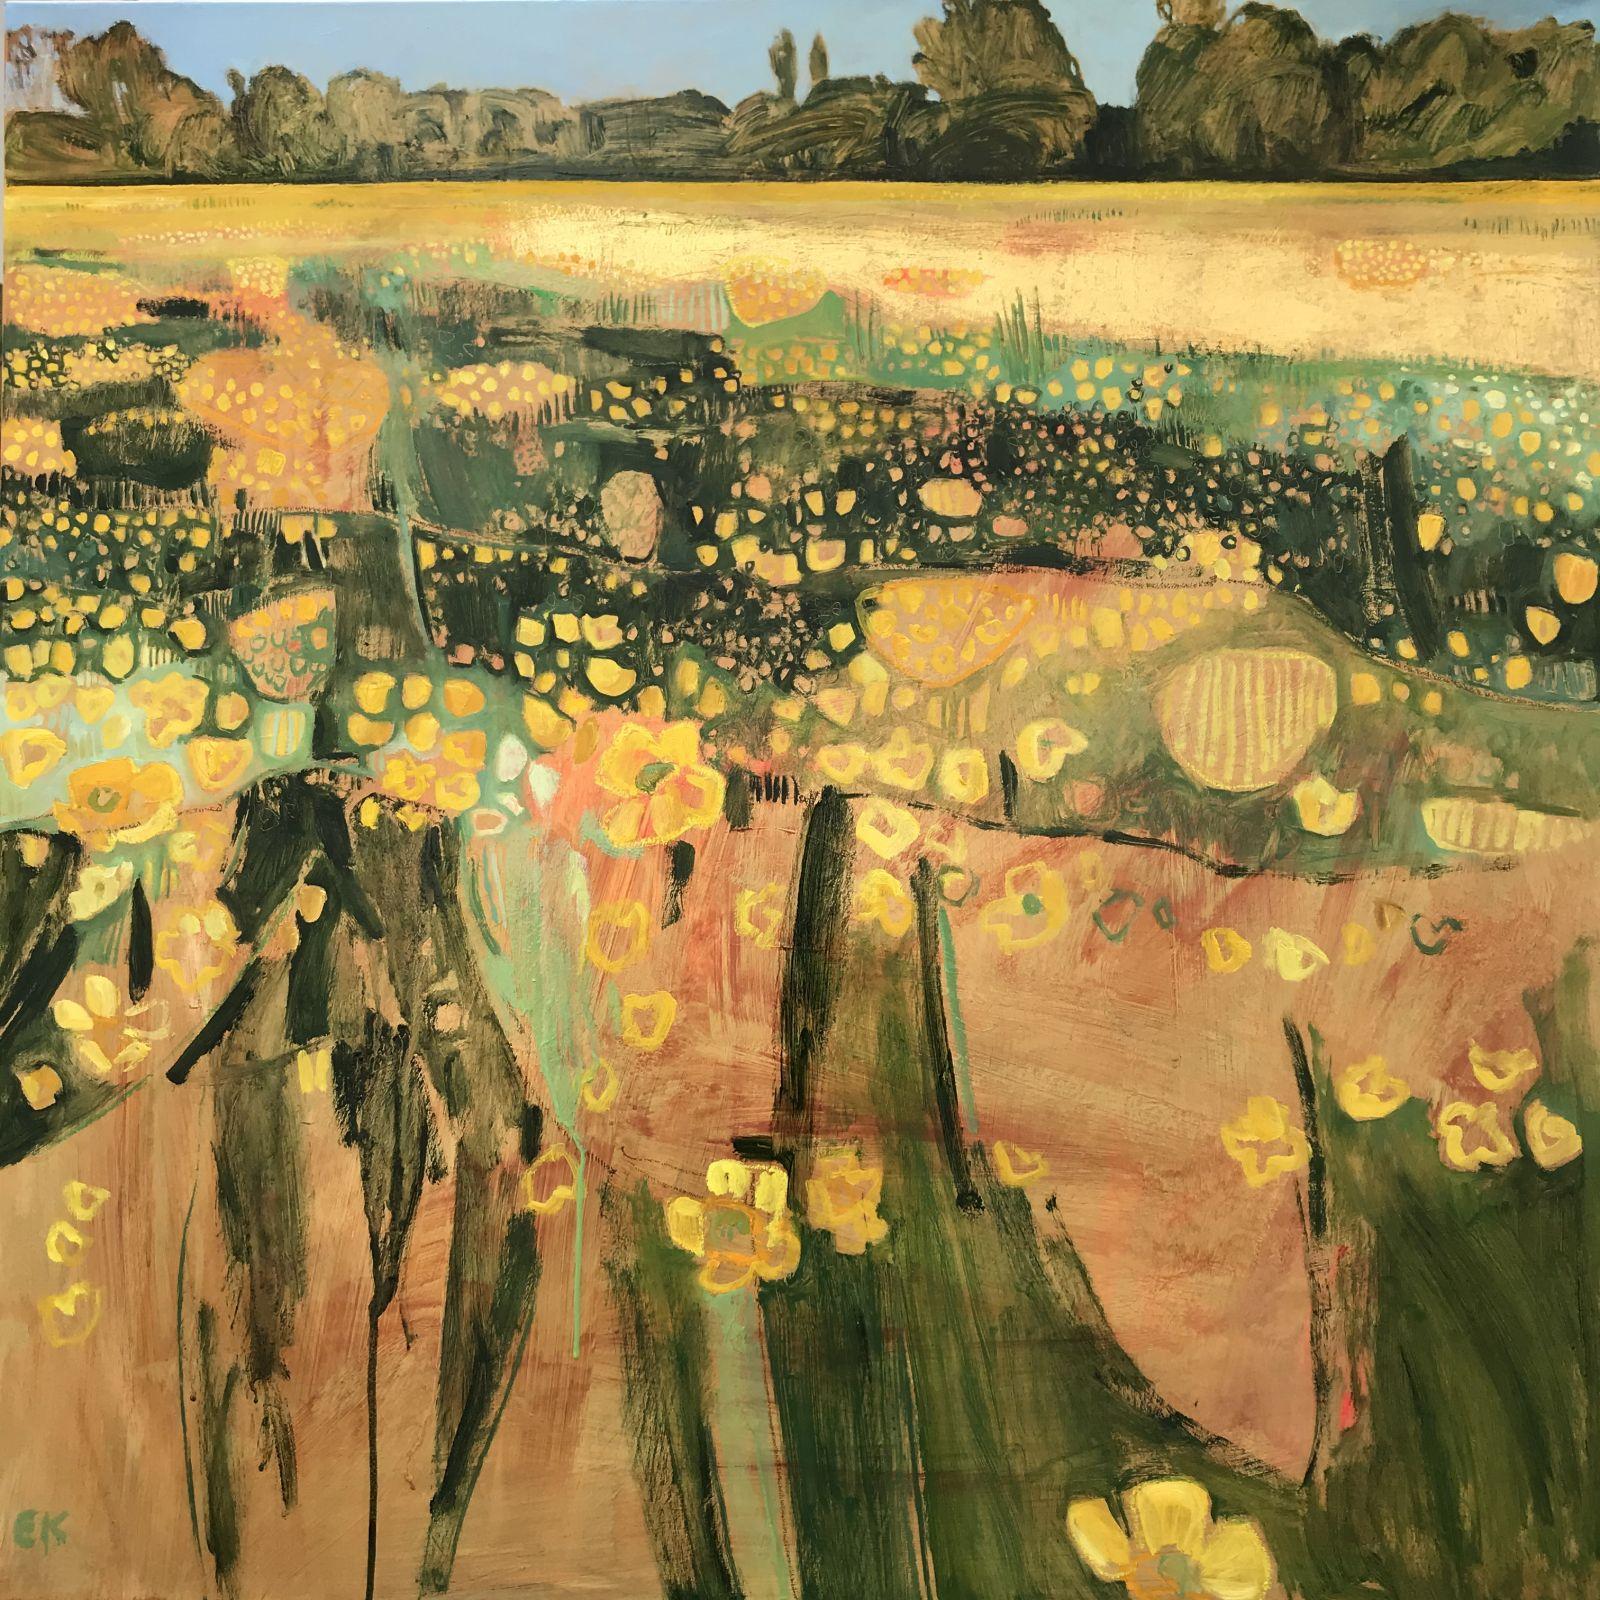 Elaine Kazimierczuk: Re-Fresh - Golden Buttercups down Binsey Lane